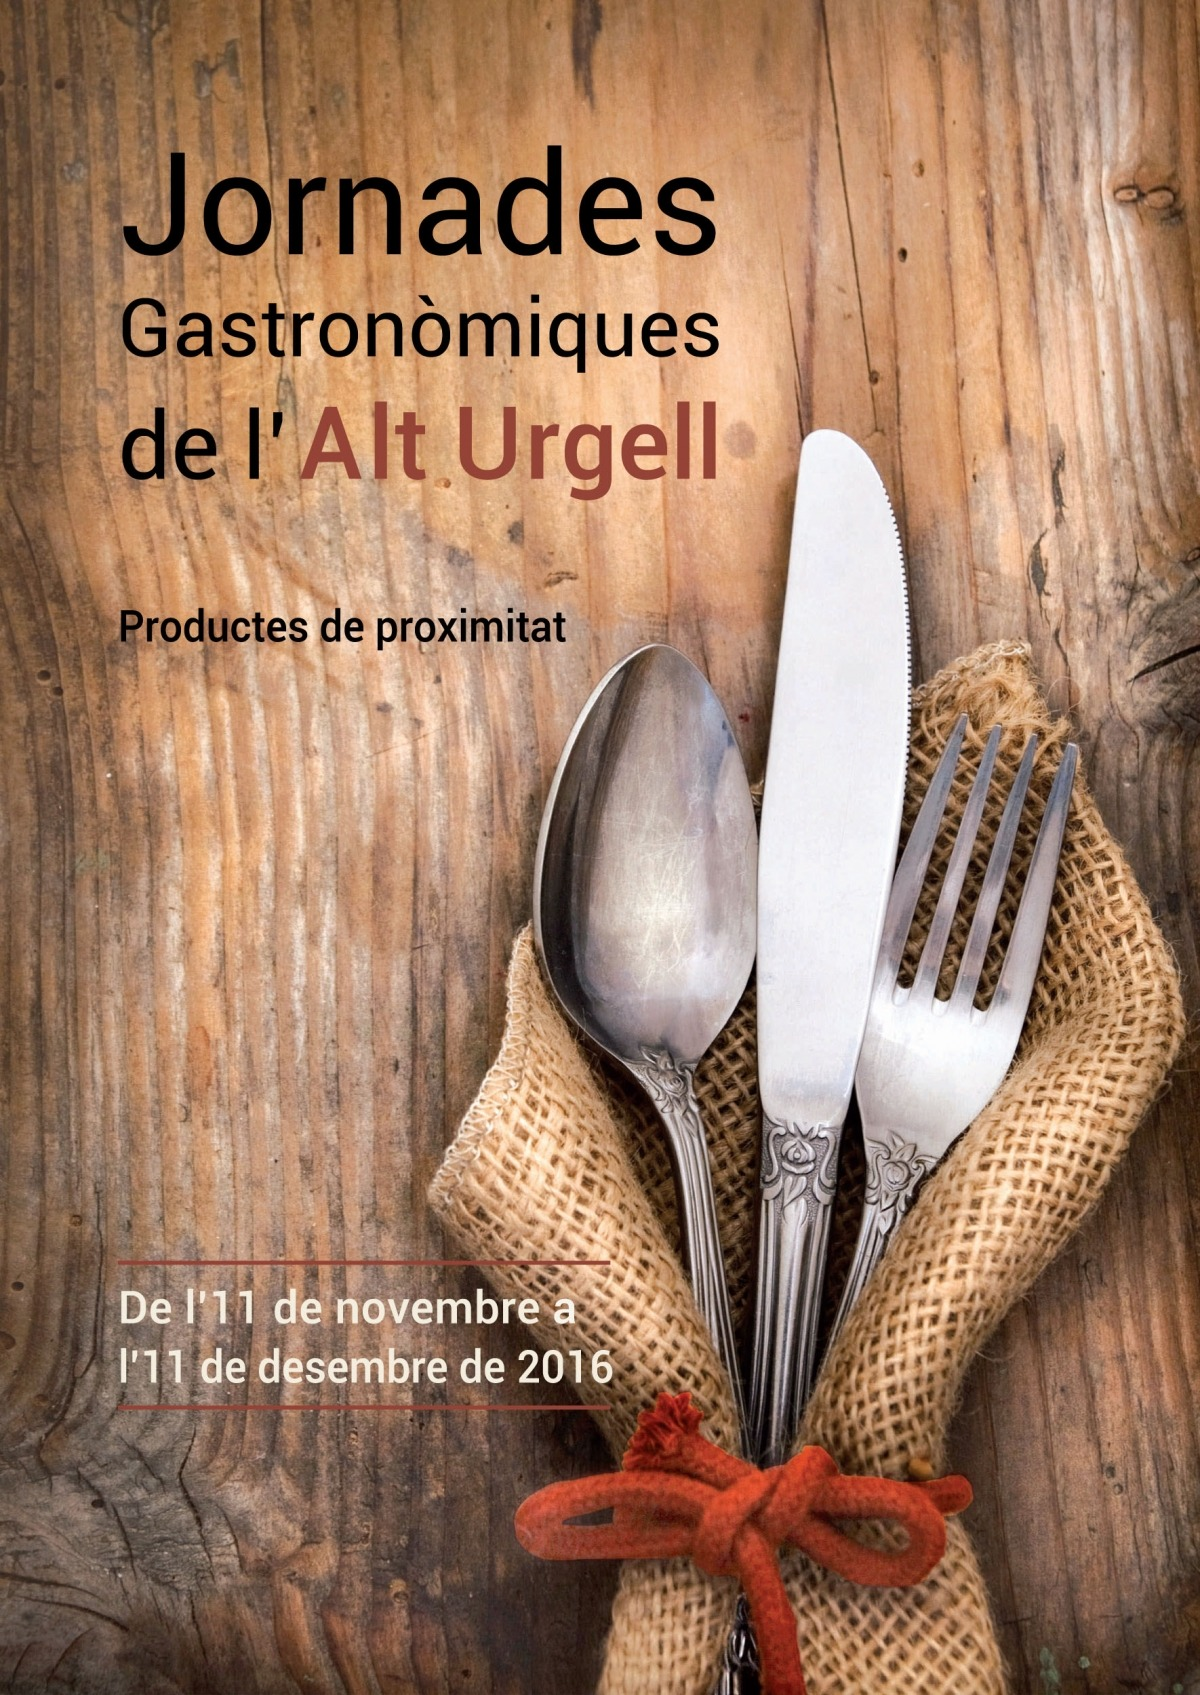 Dotze participants a les Jornades gastronòmiques de l'Alt Urgell